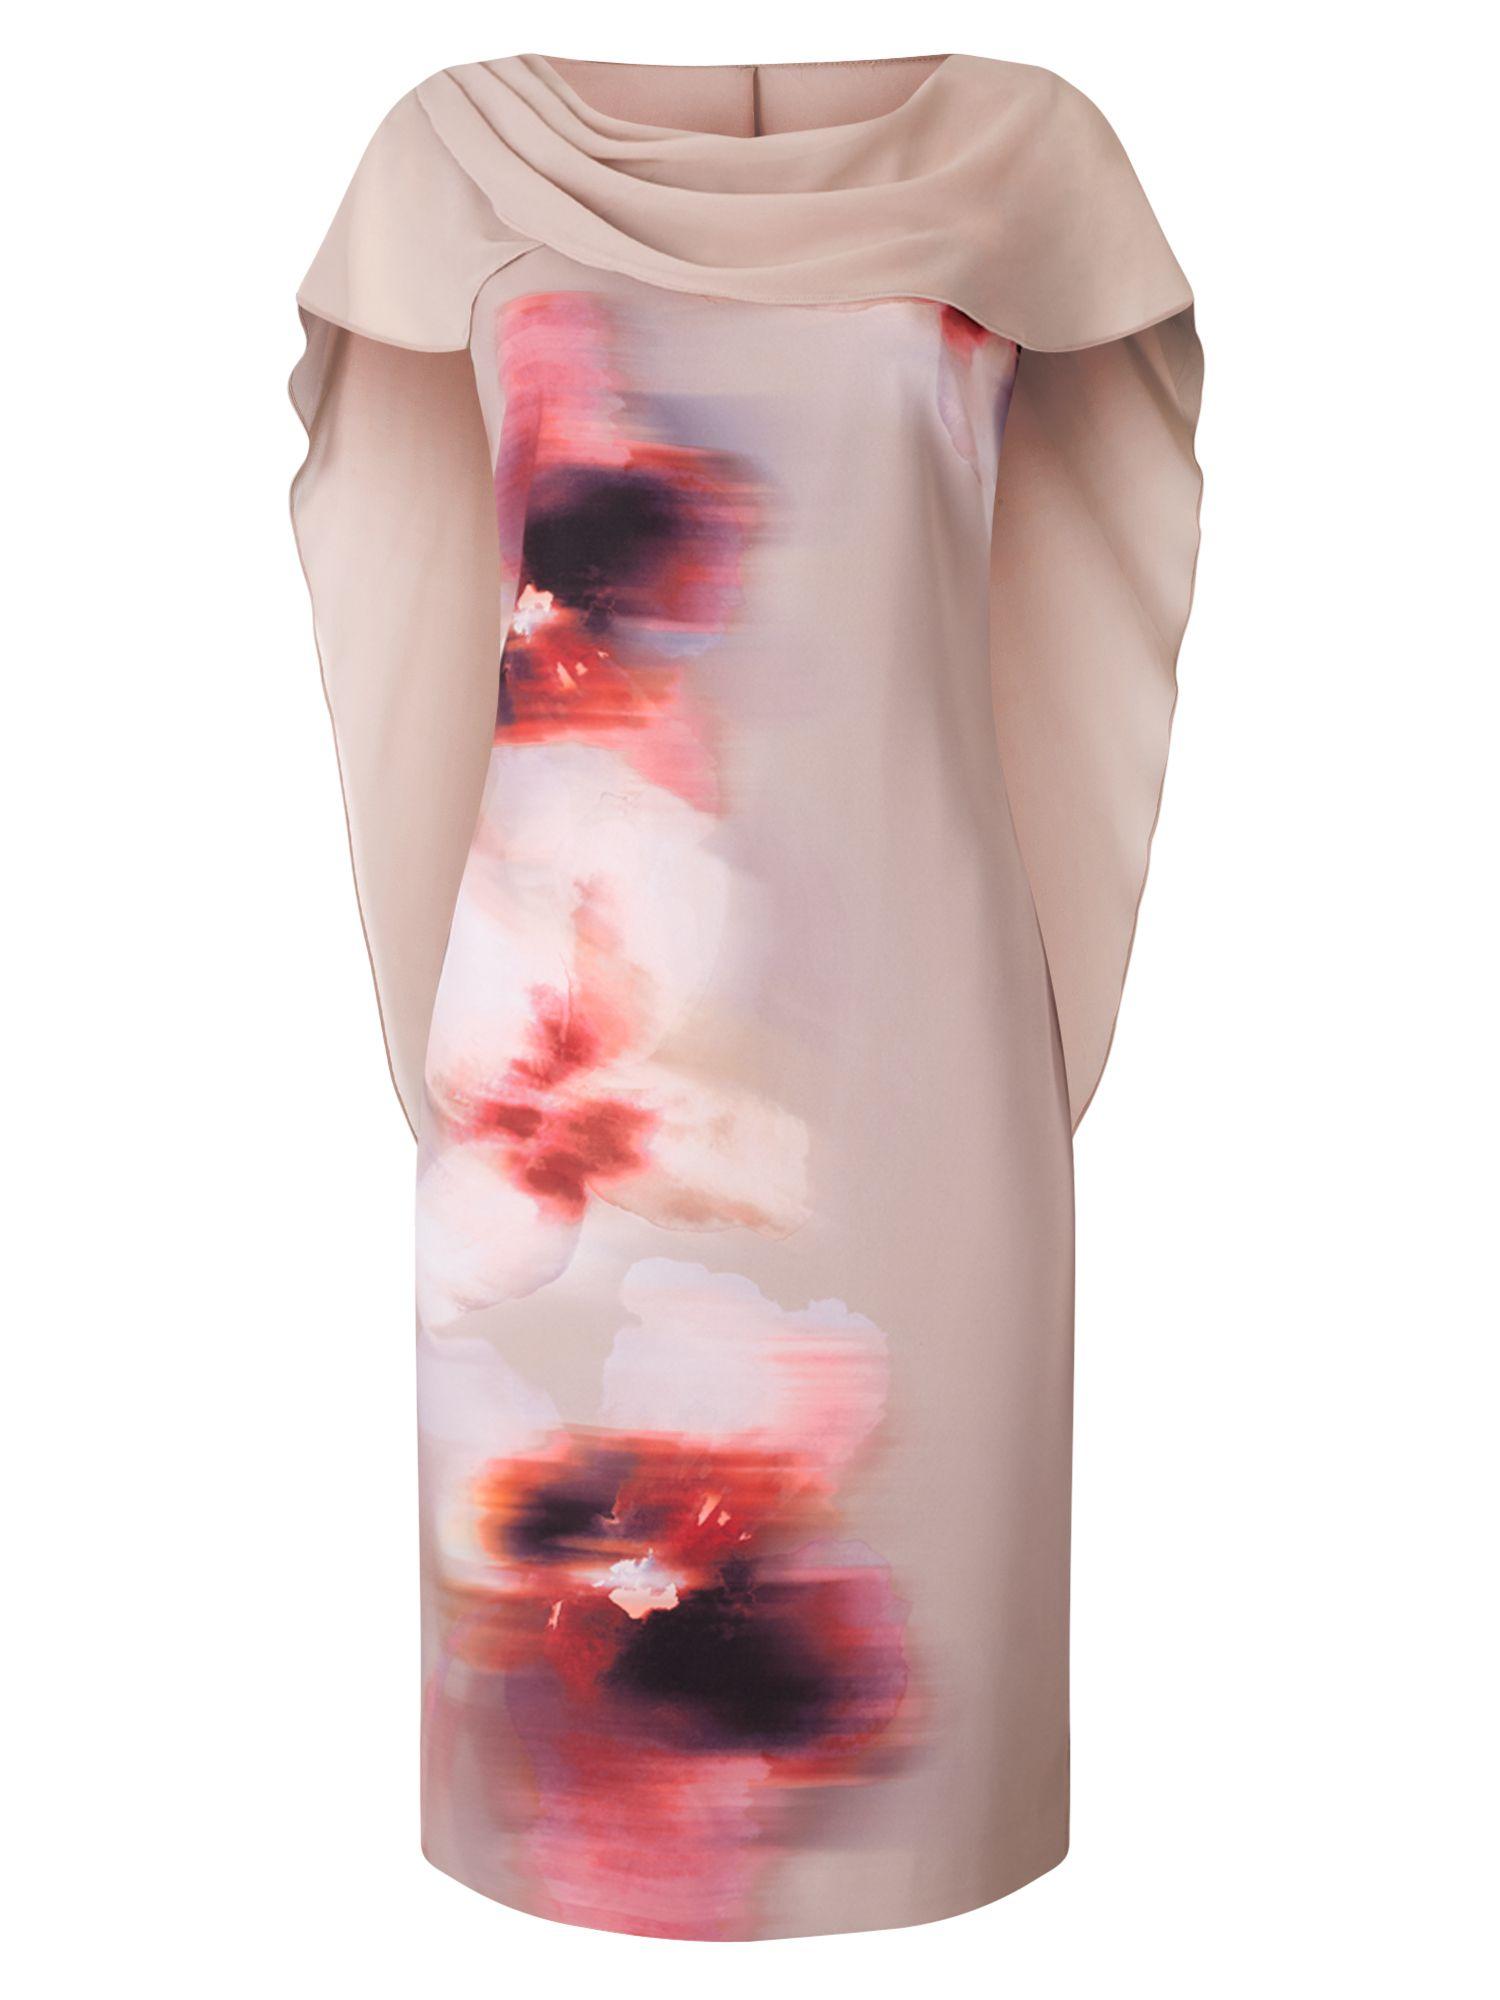 Shop & Jacques Vert & PRINTED DRAPE CAPE DRESS at http://www.jacques ...